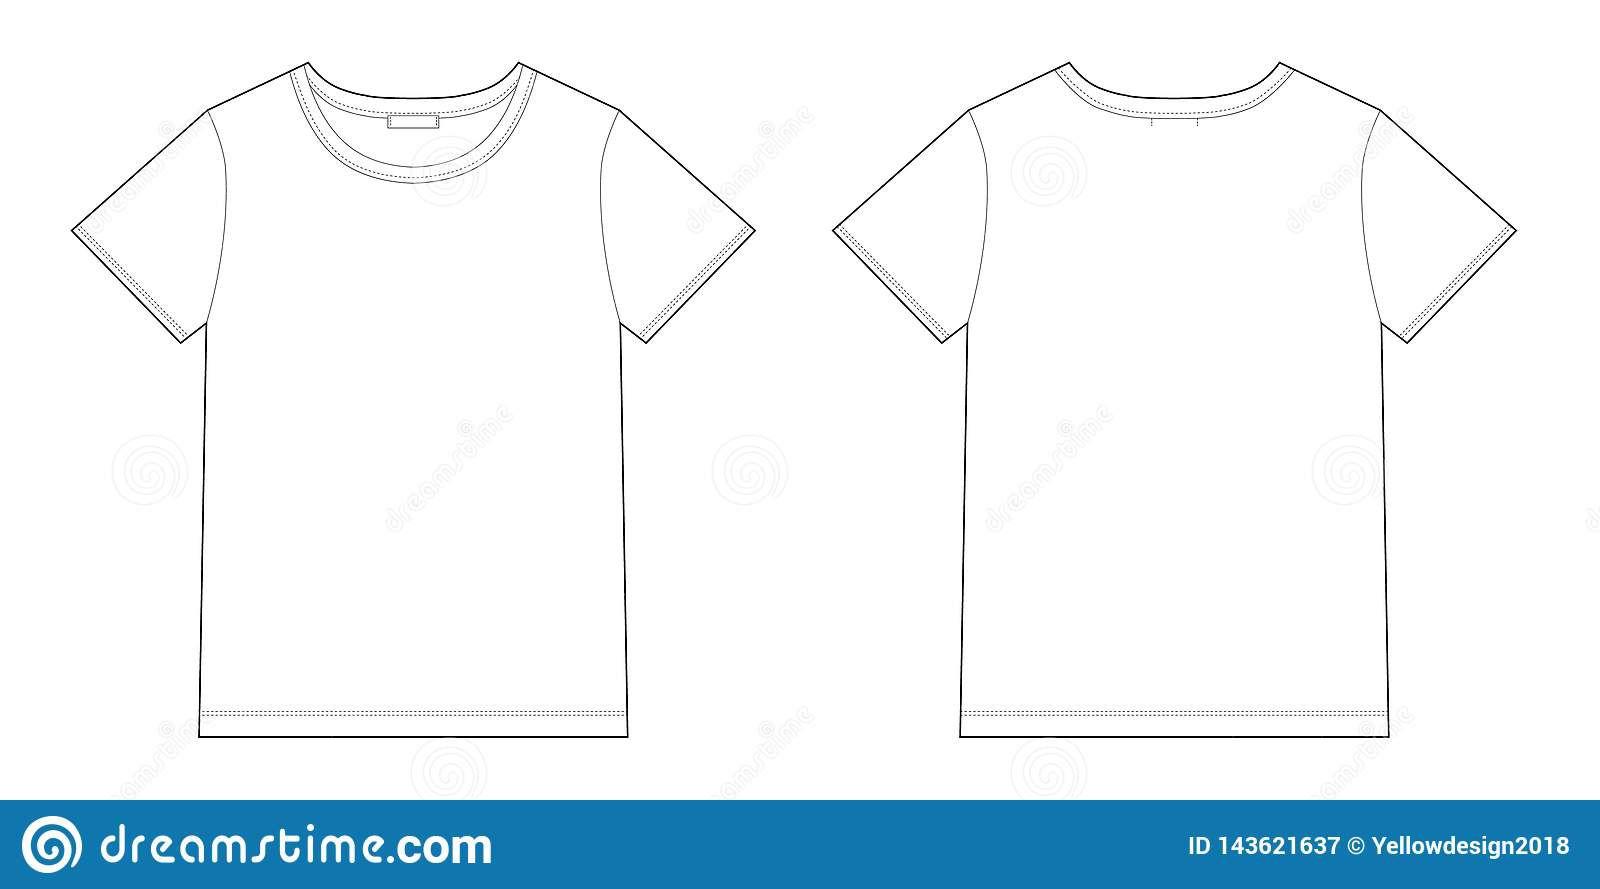 006 Surprising T Shirt Design Template Free High Resolution  Psd DownloadFull